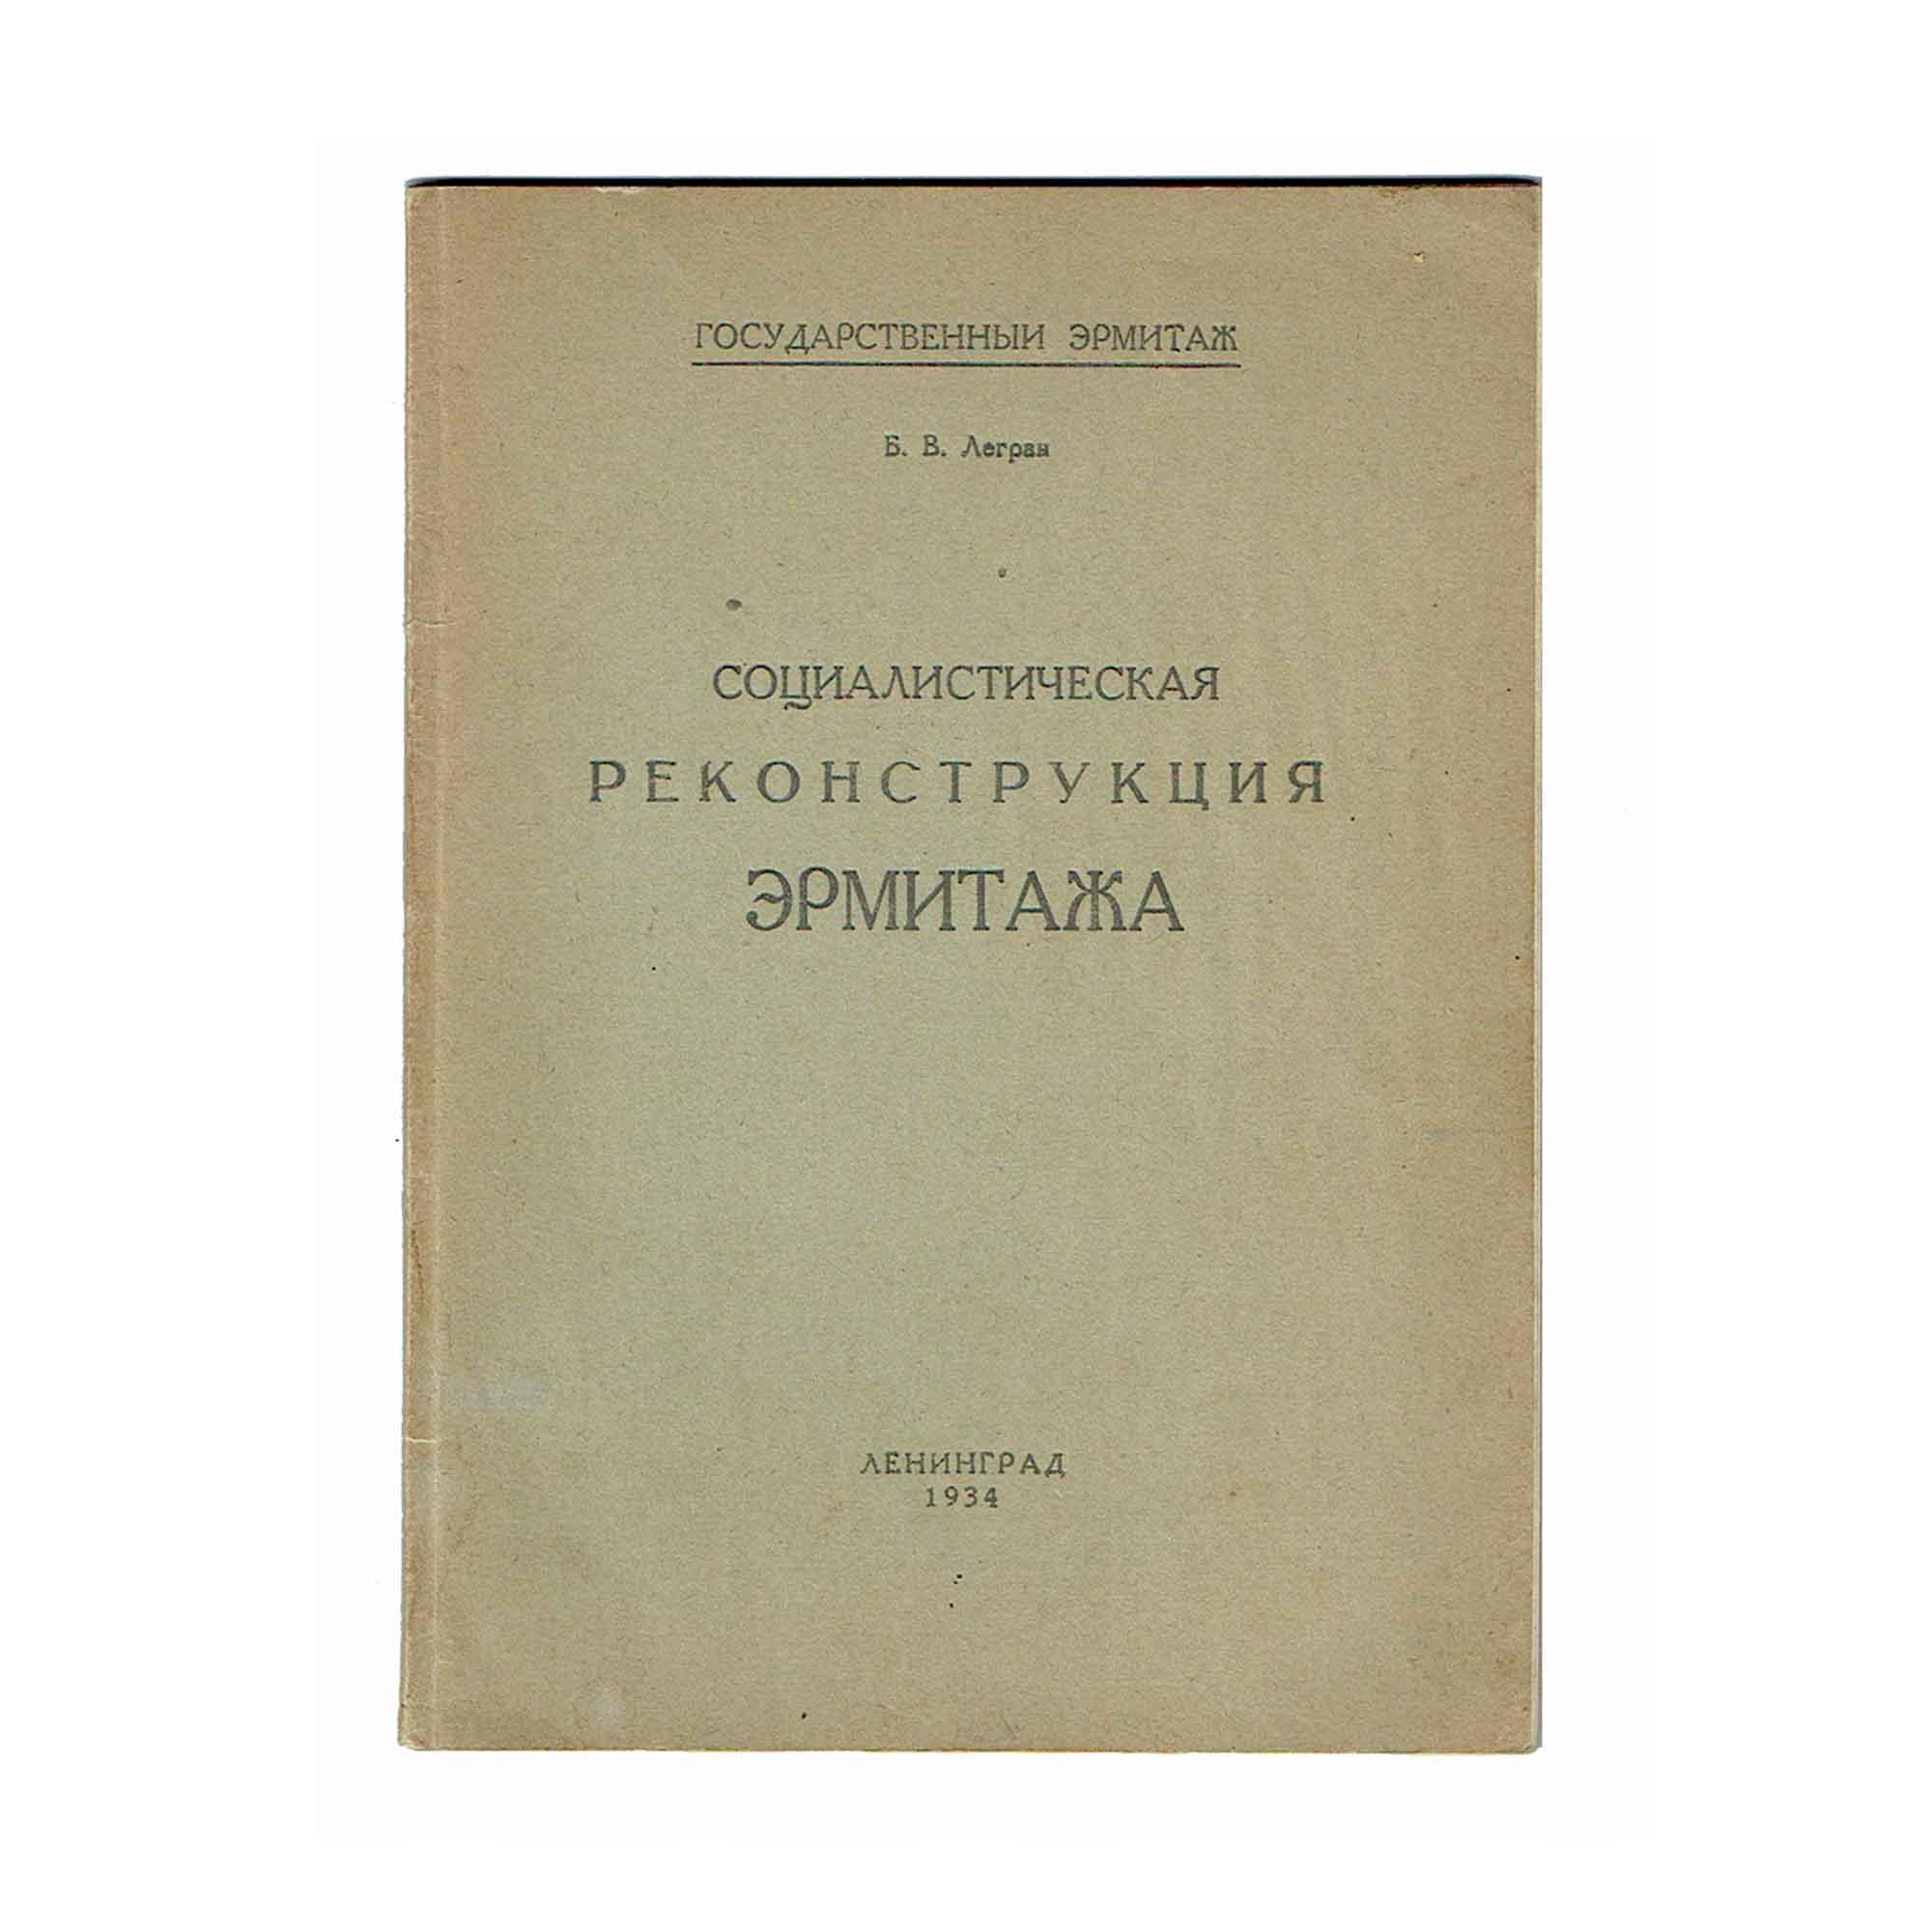 5477-Legran-Ermitage-1934-Einband-frei-N.jpeg